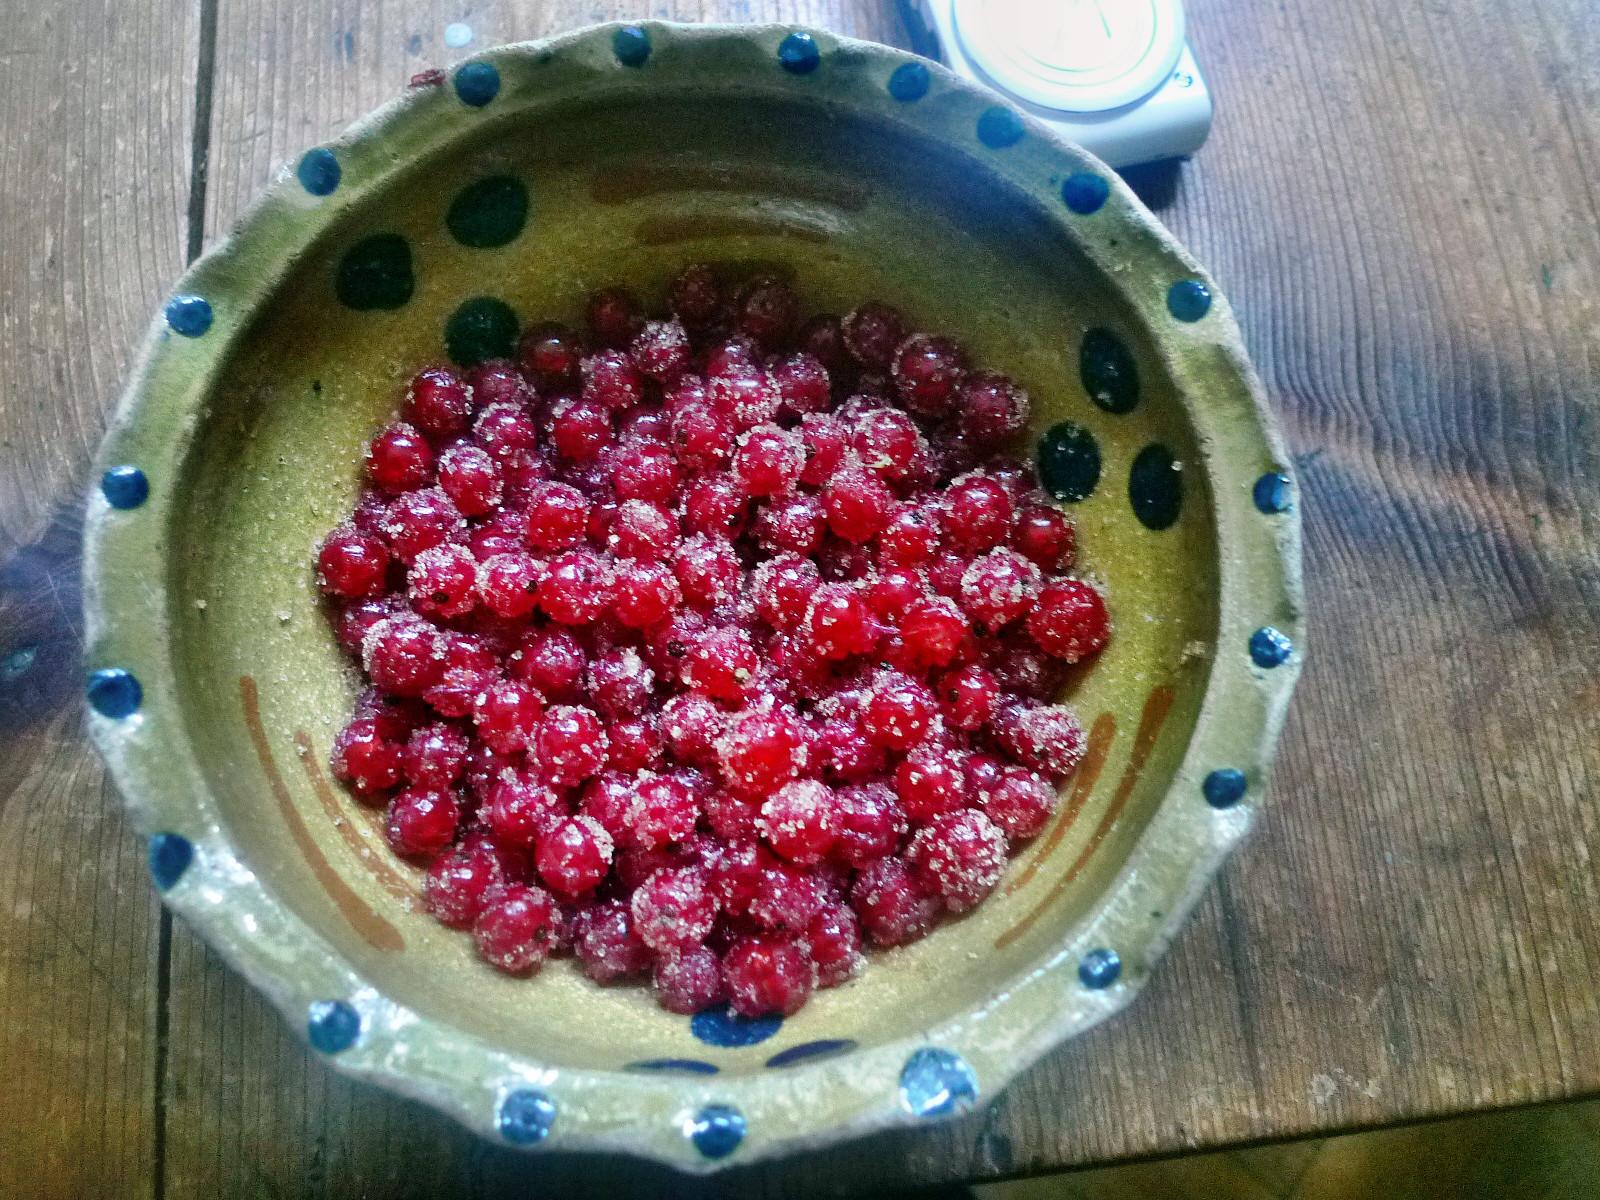 Crepe-Pilze-Salate-24.8.14   (17)